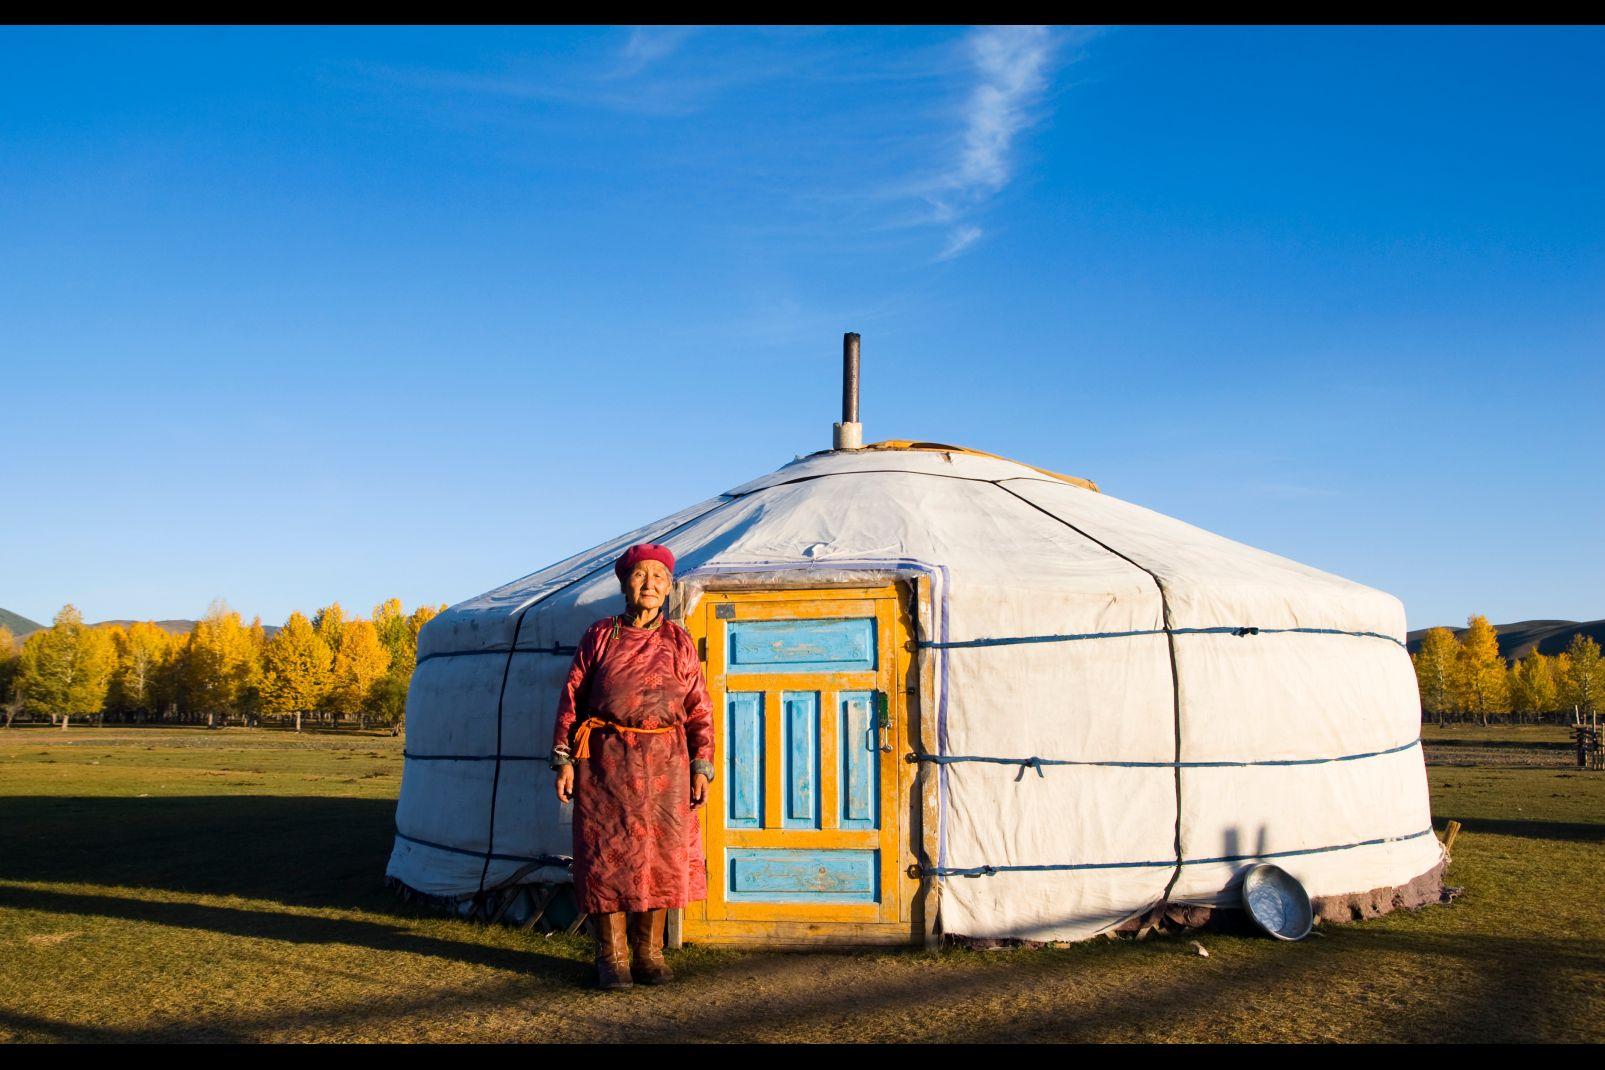 Mongolia interior, China